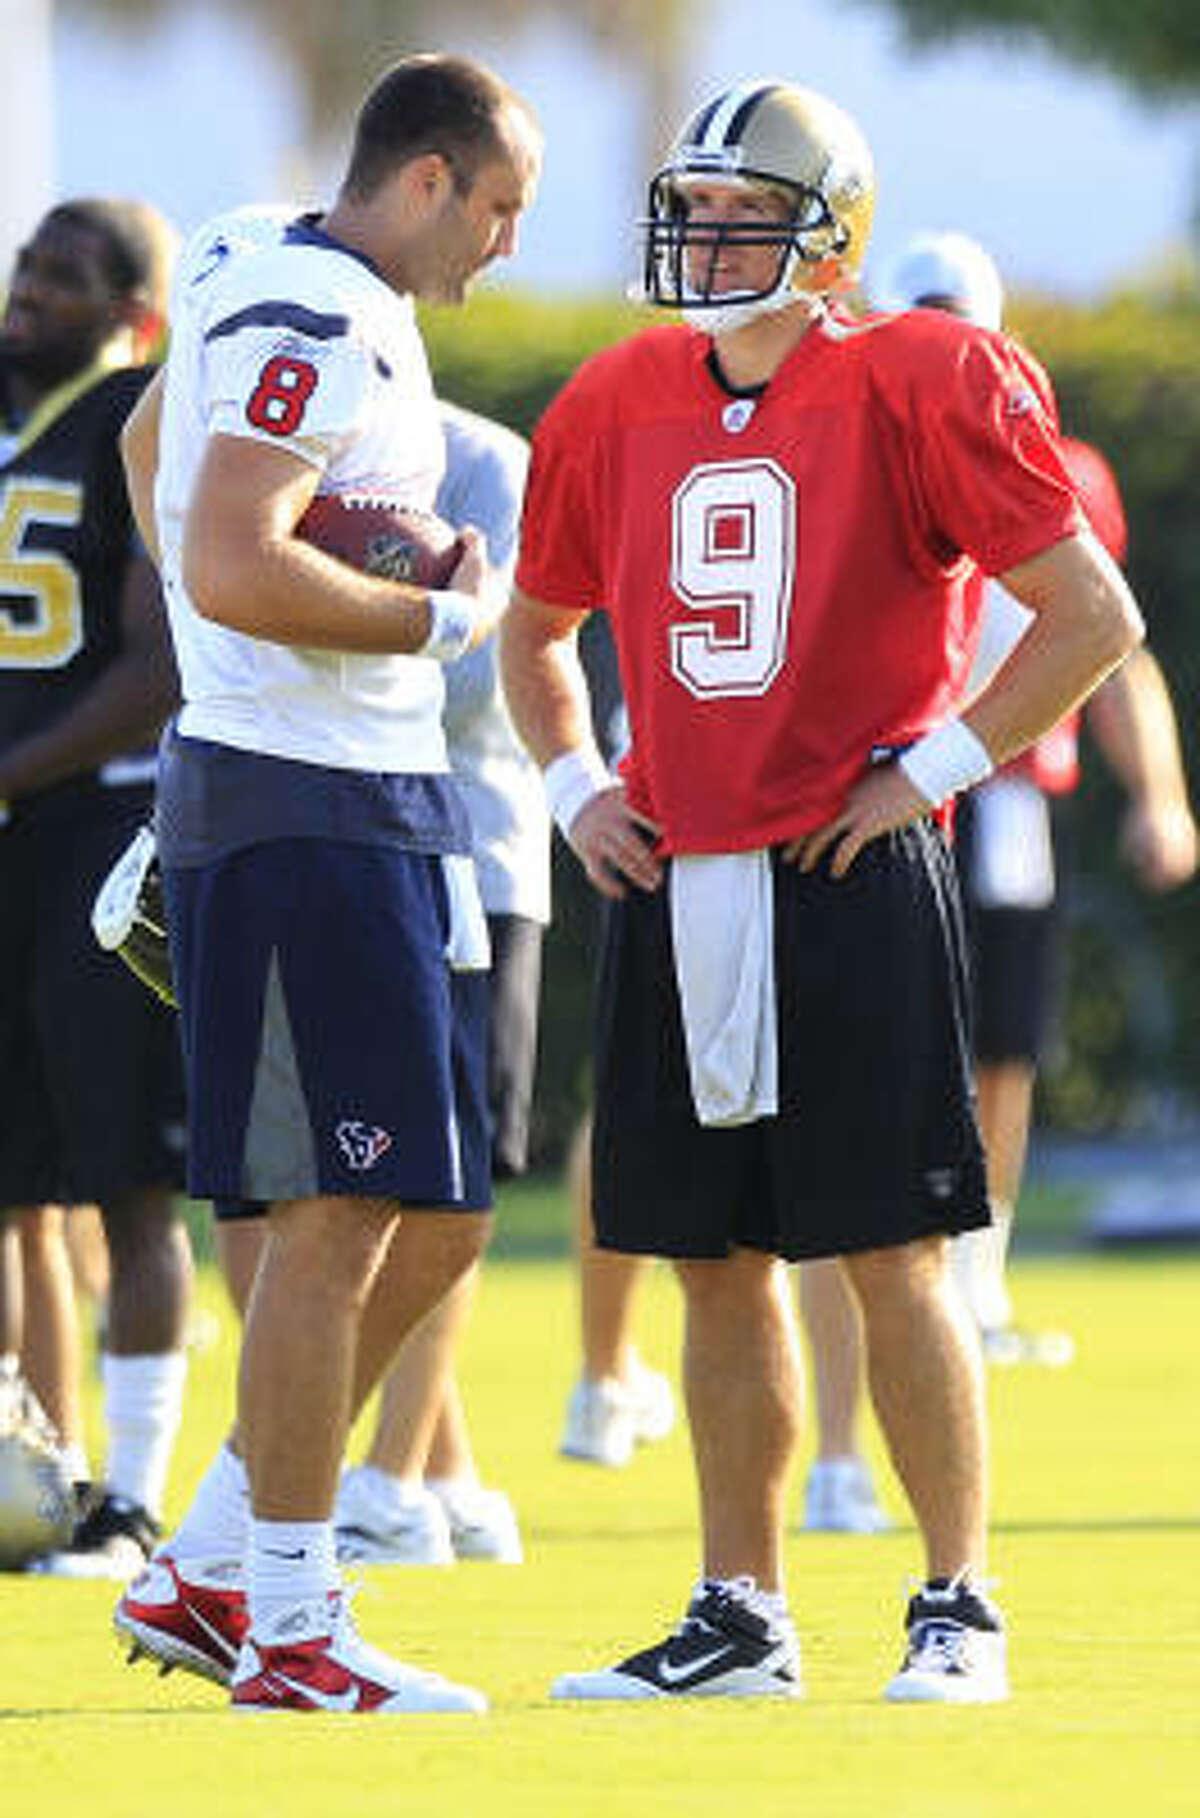 Texans quarterback Matt Schaub (8) and Saints quarterback Drew Brees talk before the start of Thursday's practice.